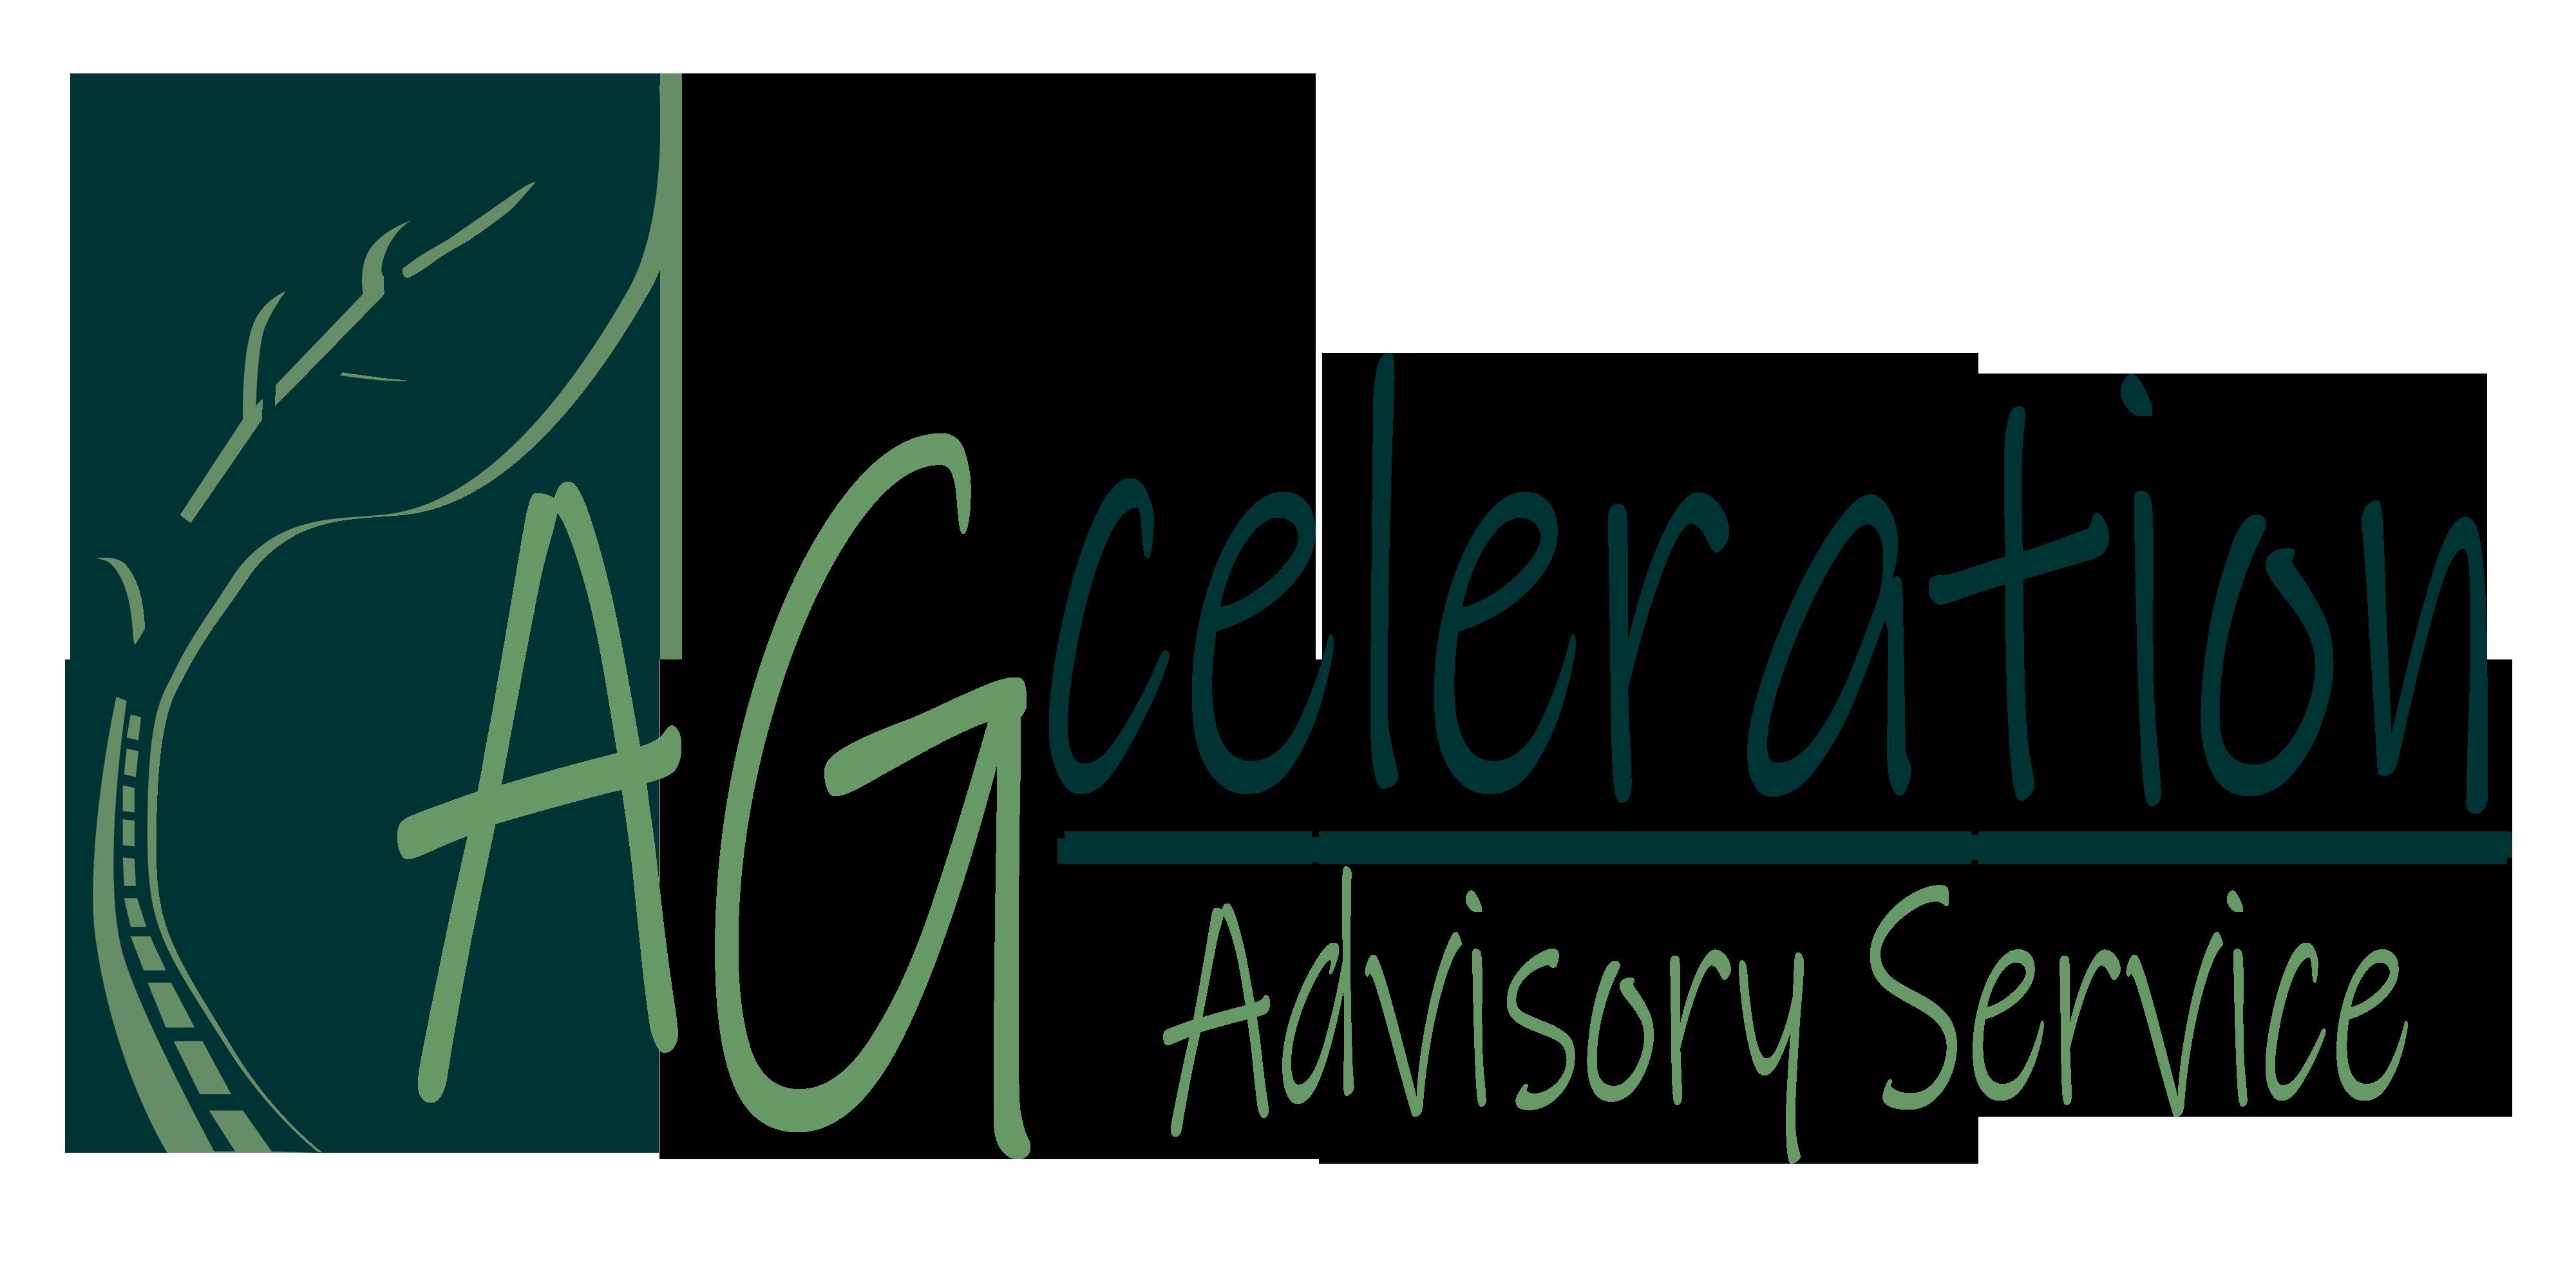 AGceleration Advisory Service